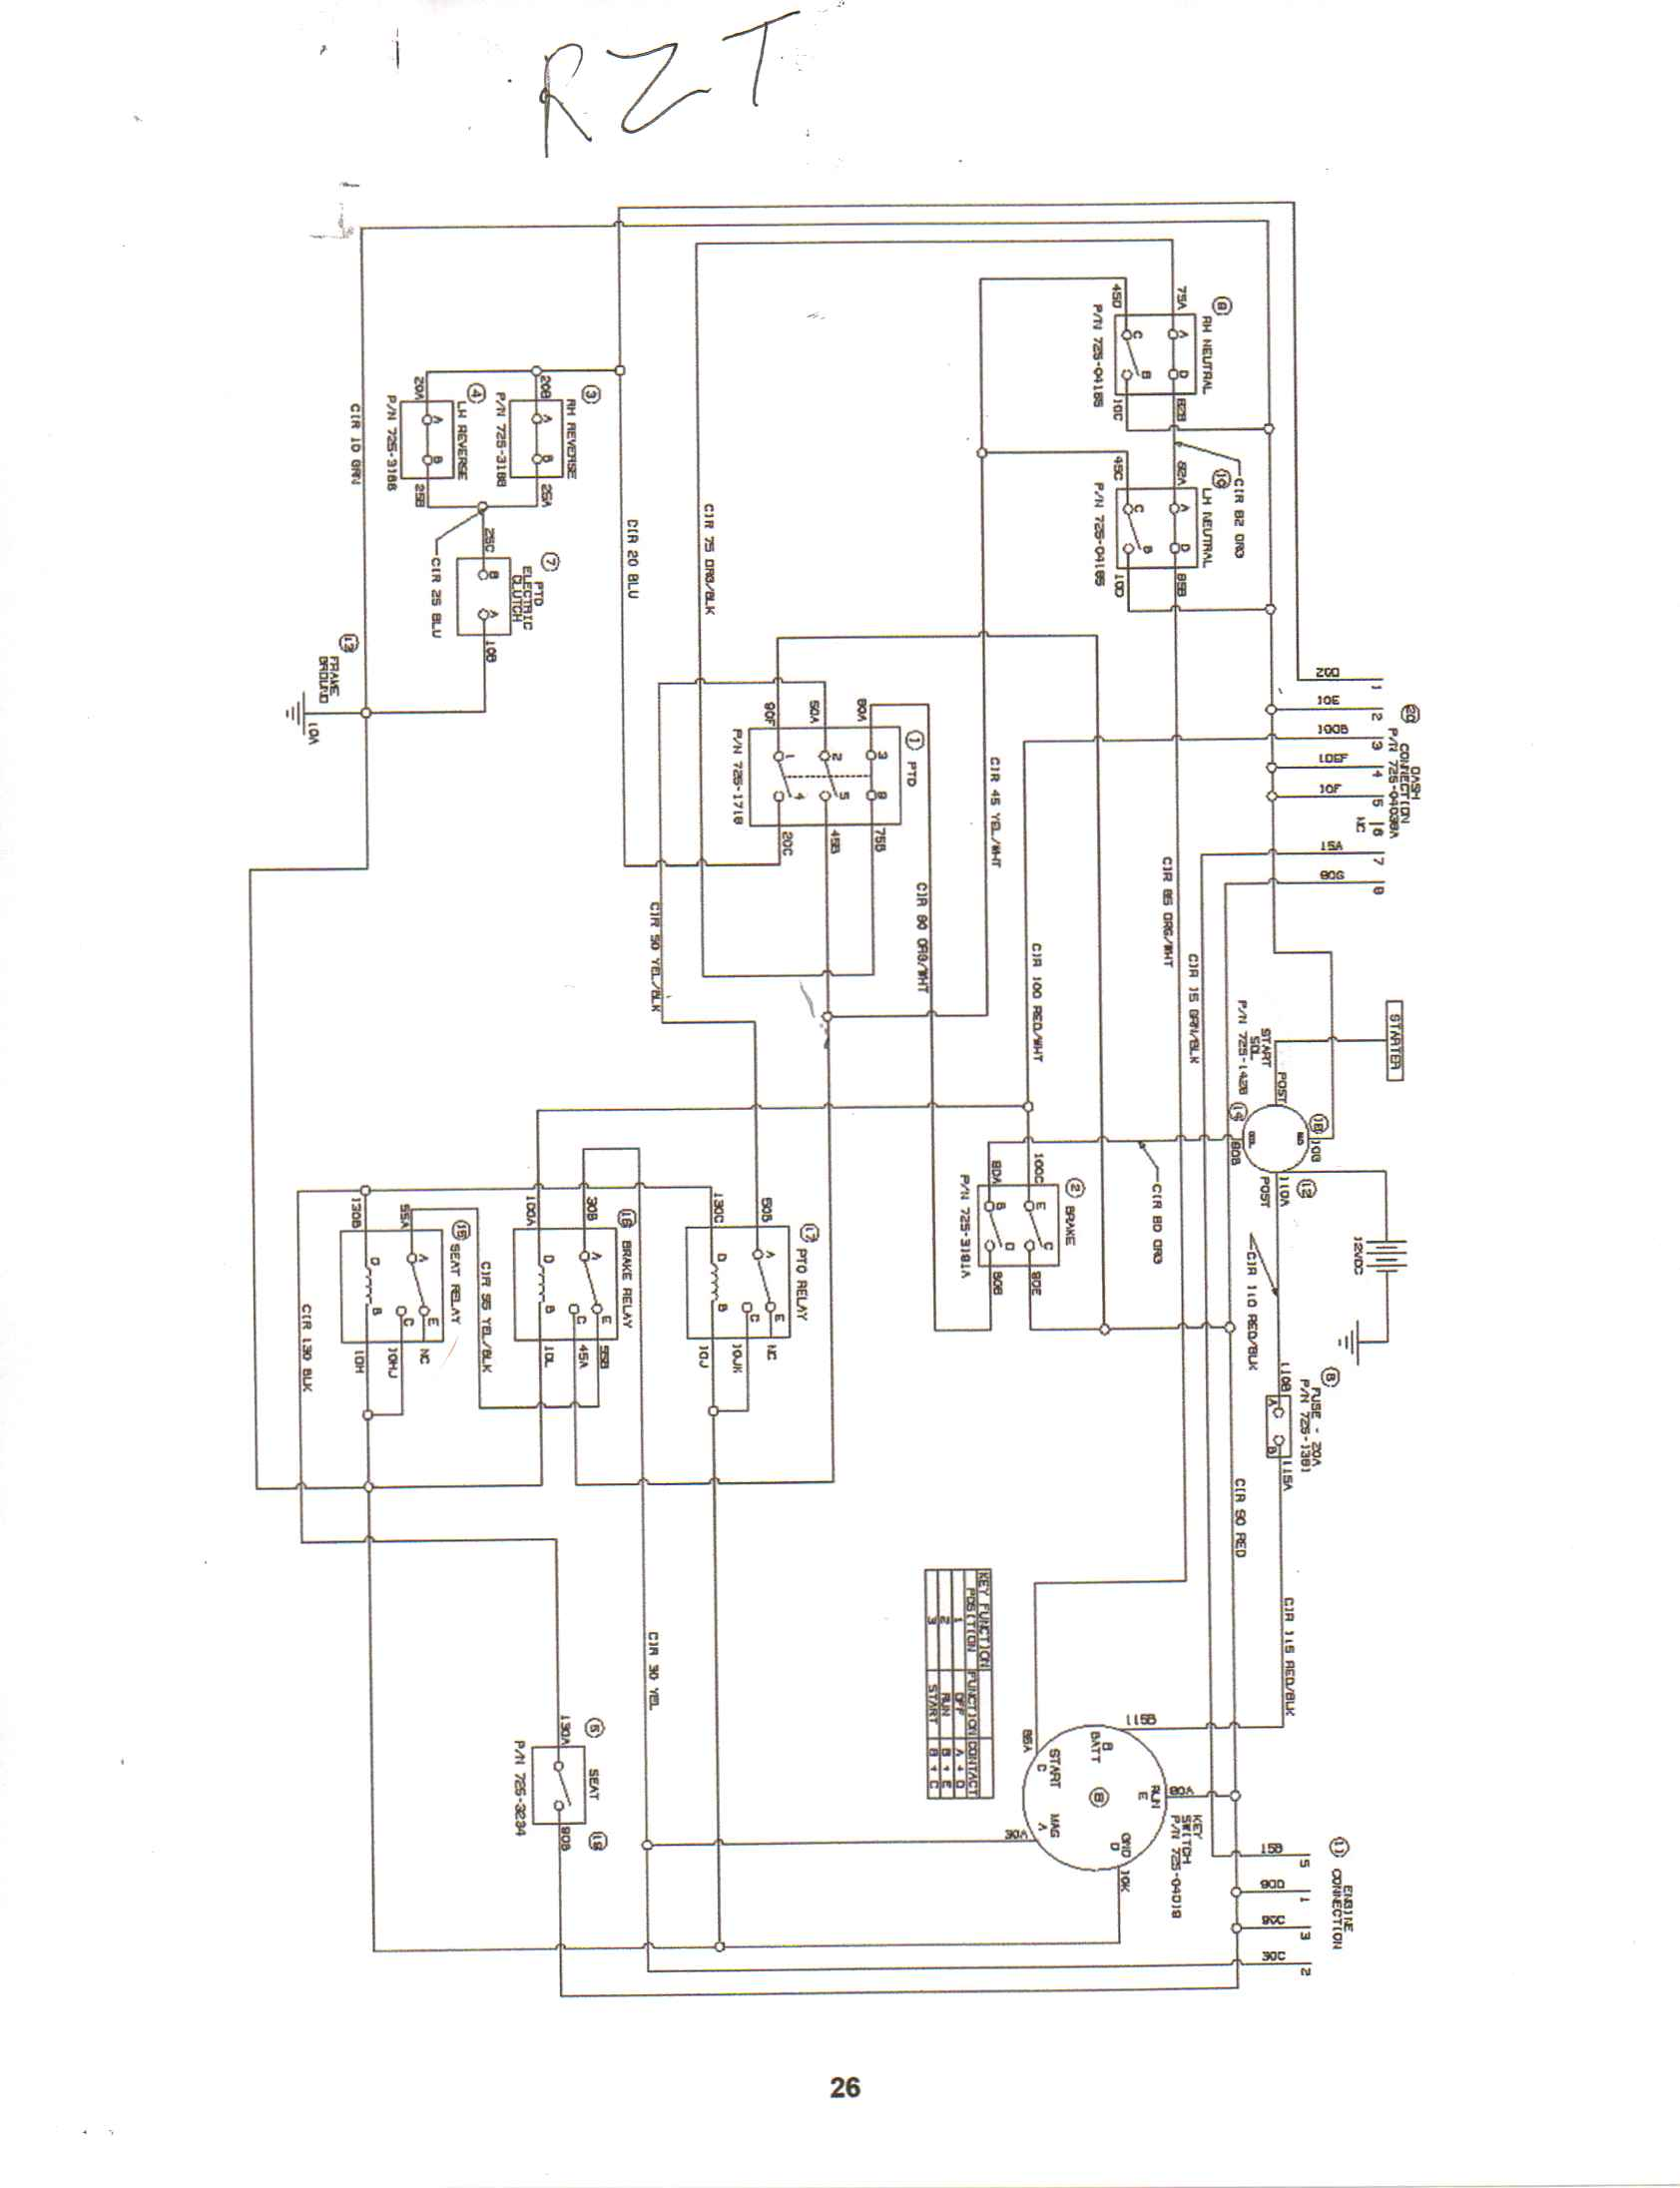 Cub Cadet Rzt 22 Wiring Diagram